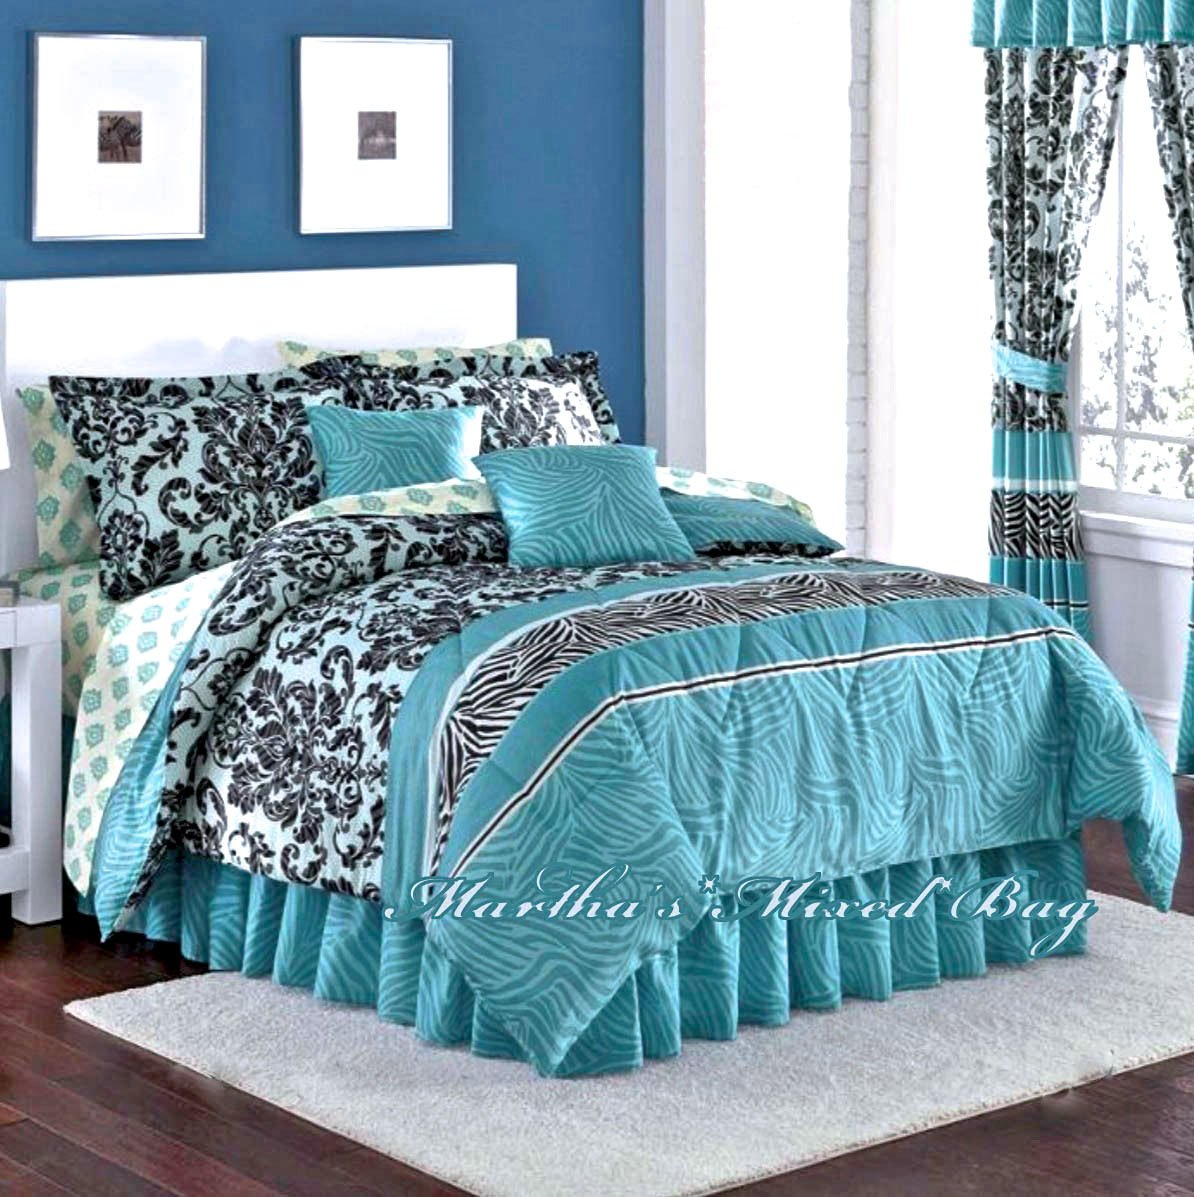 ROYAL Animal SAFARI Teal Zebra Stripe & French Damask Prints Comforter Shams Bedskirt & Sheet Set (8pc's QUEEN SIZE Bed In A Bag)